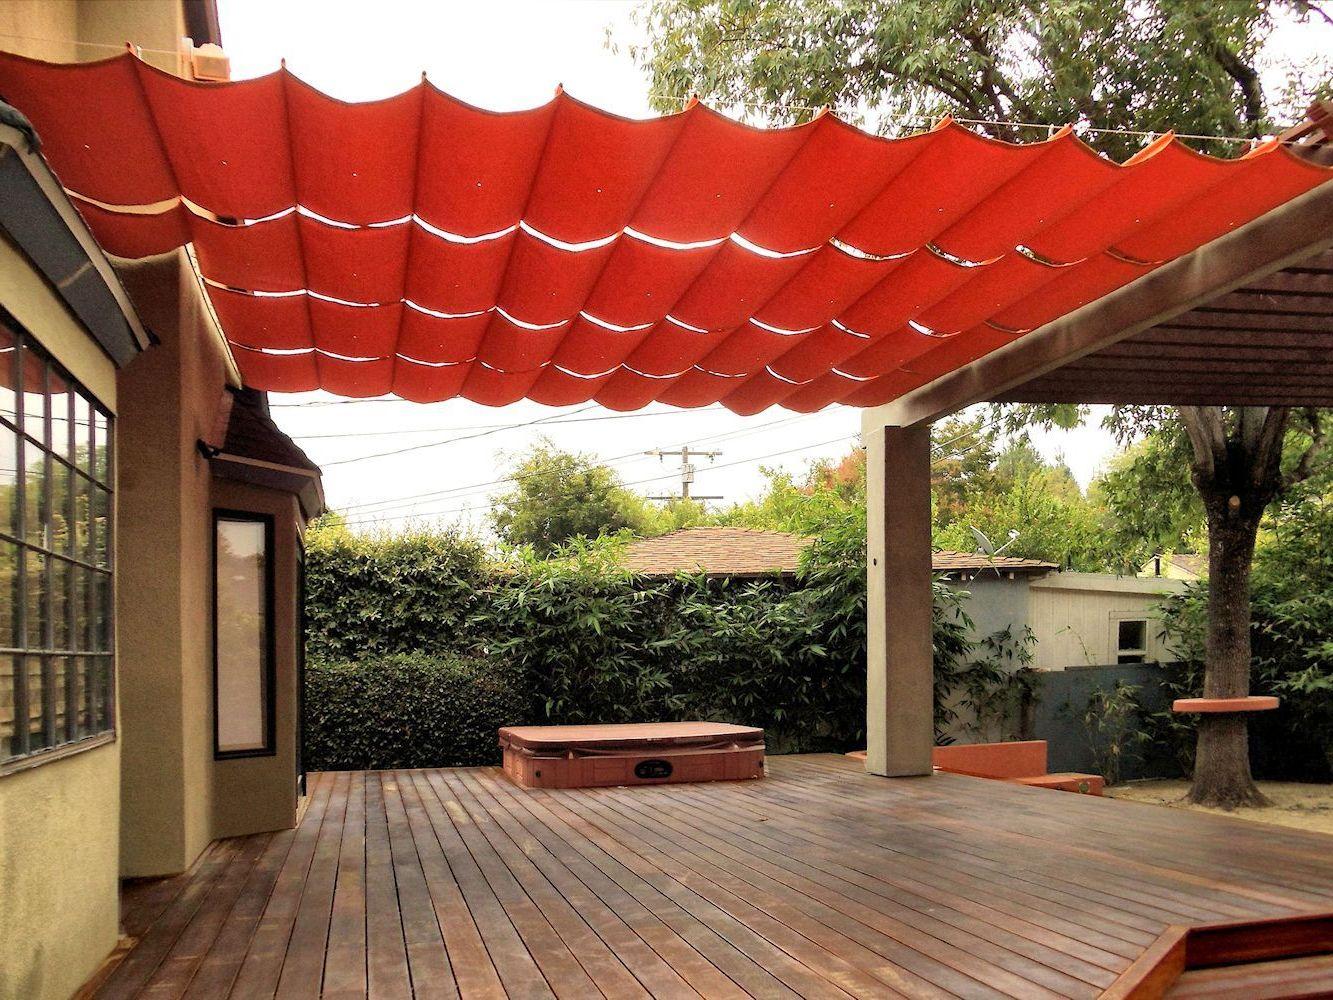 12 Inspiring Diy Deck Canopy Ideas Collection Backyard Shade Patio Shade Patio Canopy